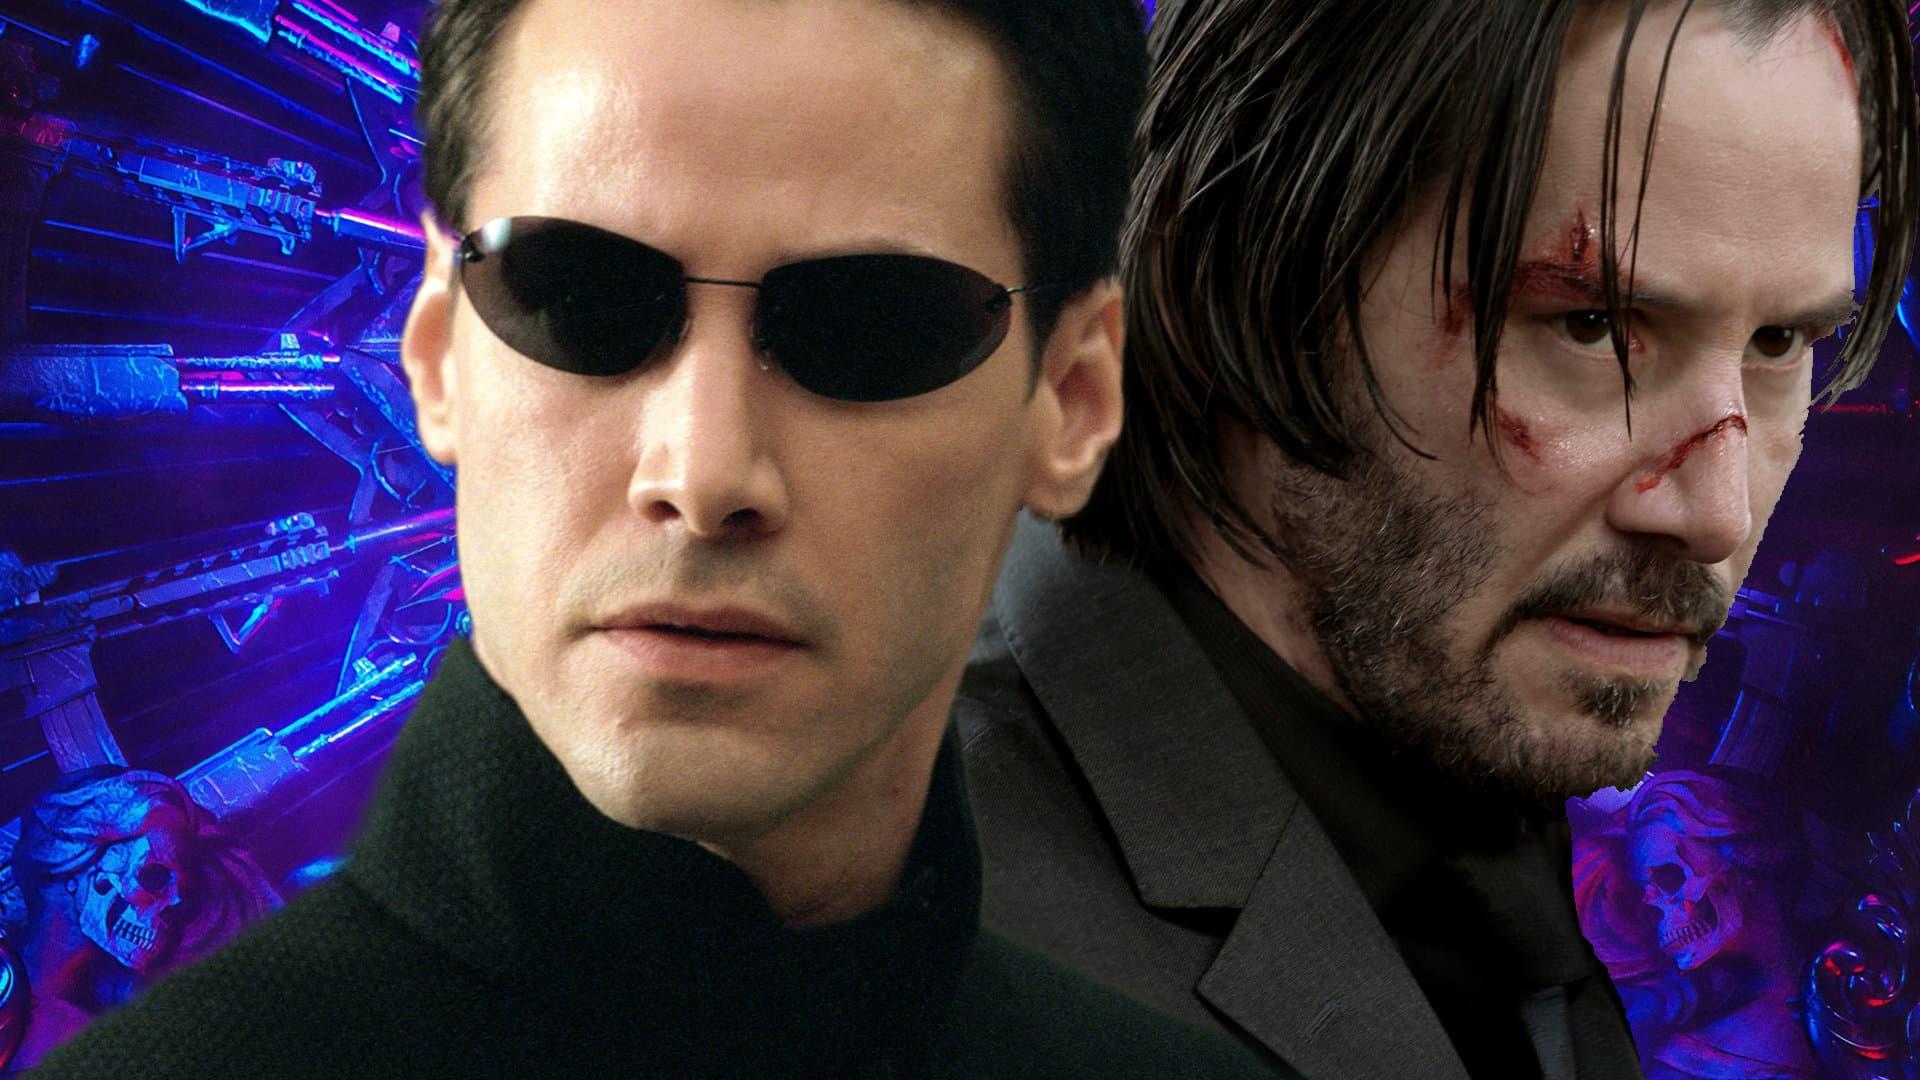 matrix john wick